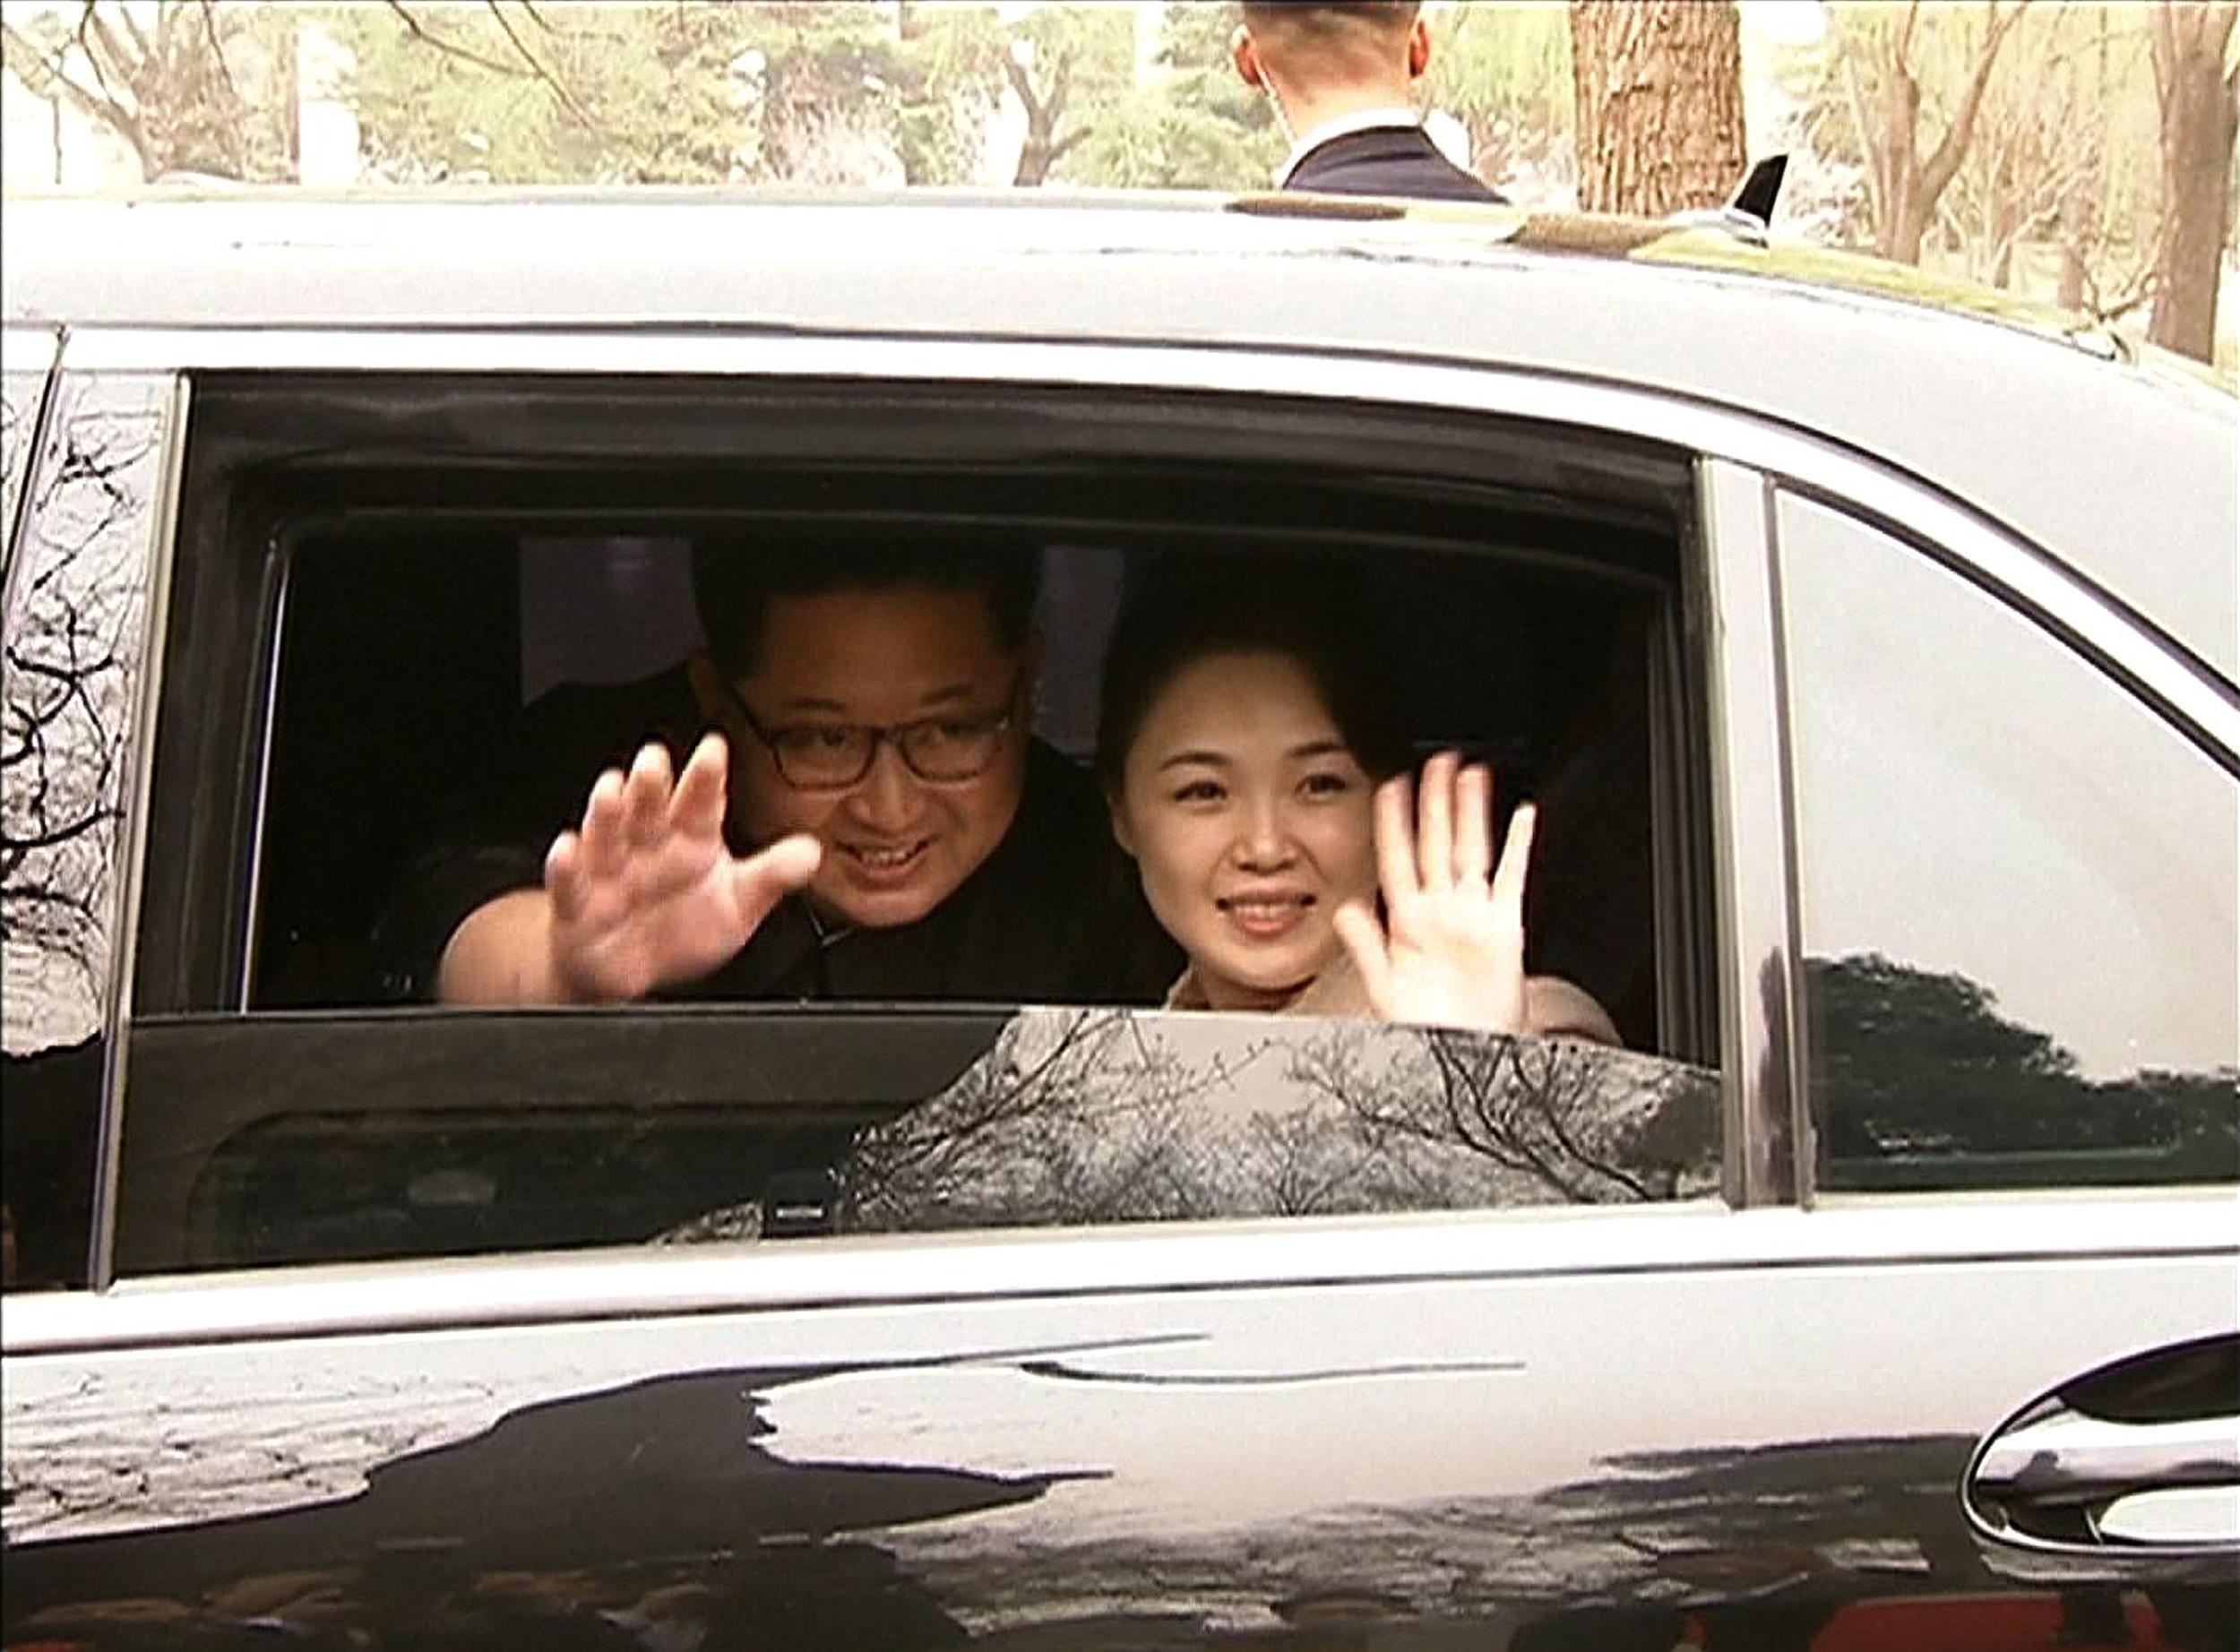 Thuong dinh Han - Trieu: 'Cuoc chien' 70 nam den hoi khep lai? hinh anh 4